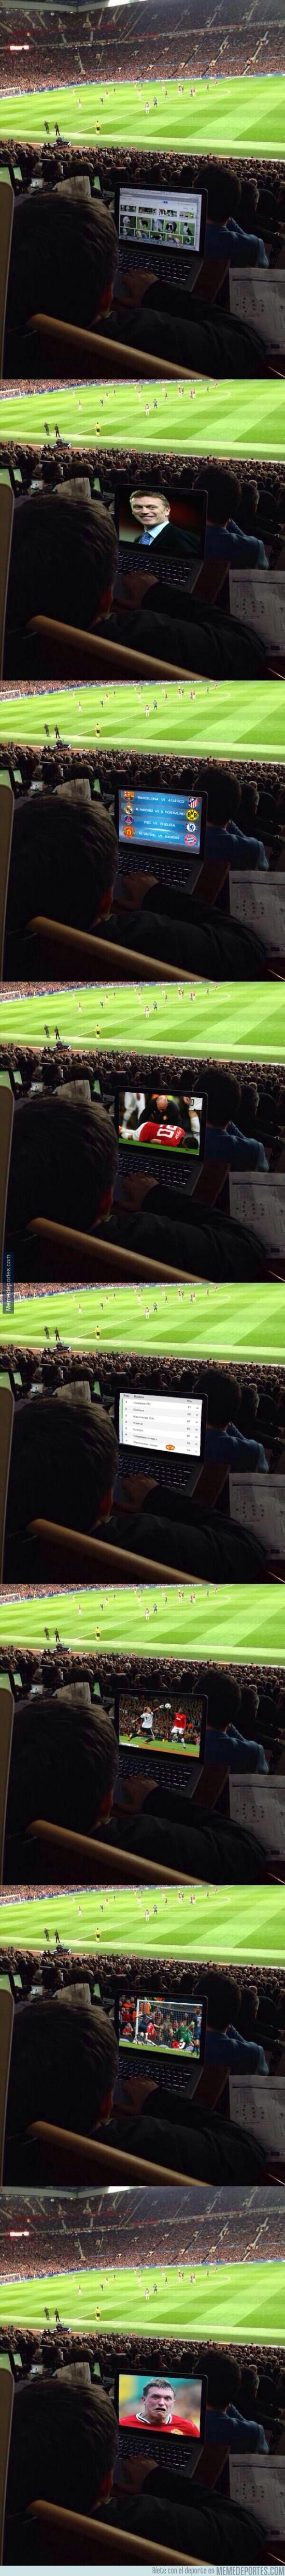 292894 - Ya tardaban en llegar los chops del chico en Old Trafford